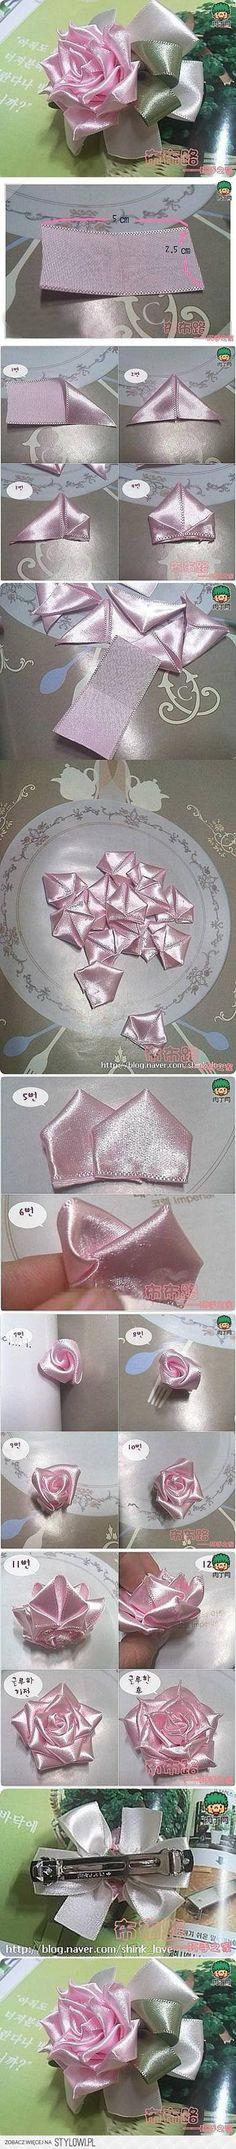 DIY Easy Satin Ribbon Rose Hairpin DIY Projects   Usefu… na Stylowi.pl